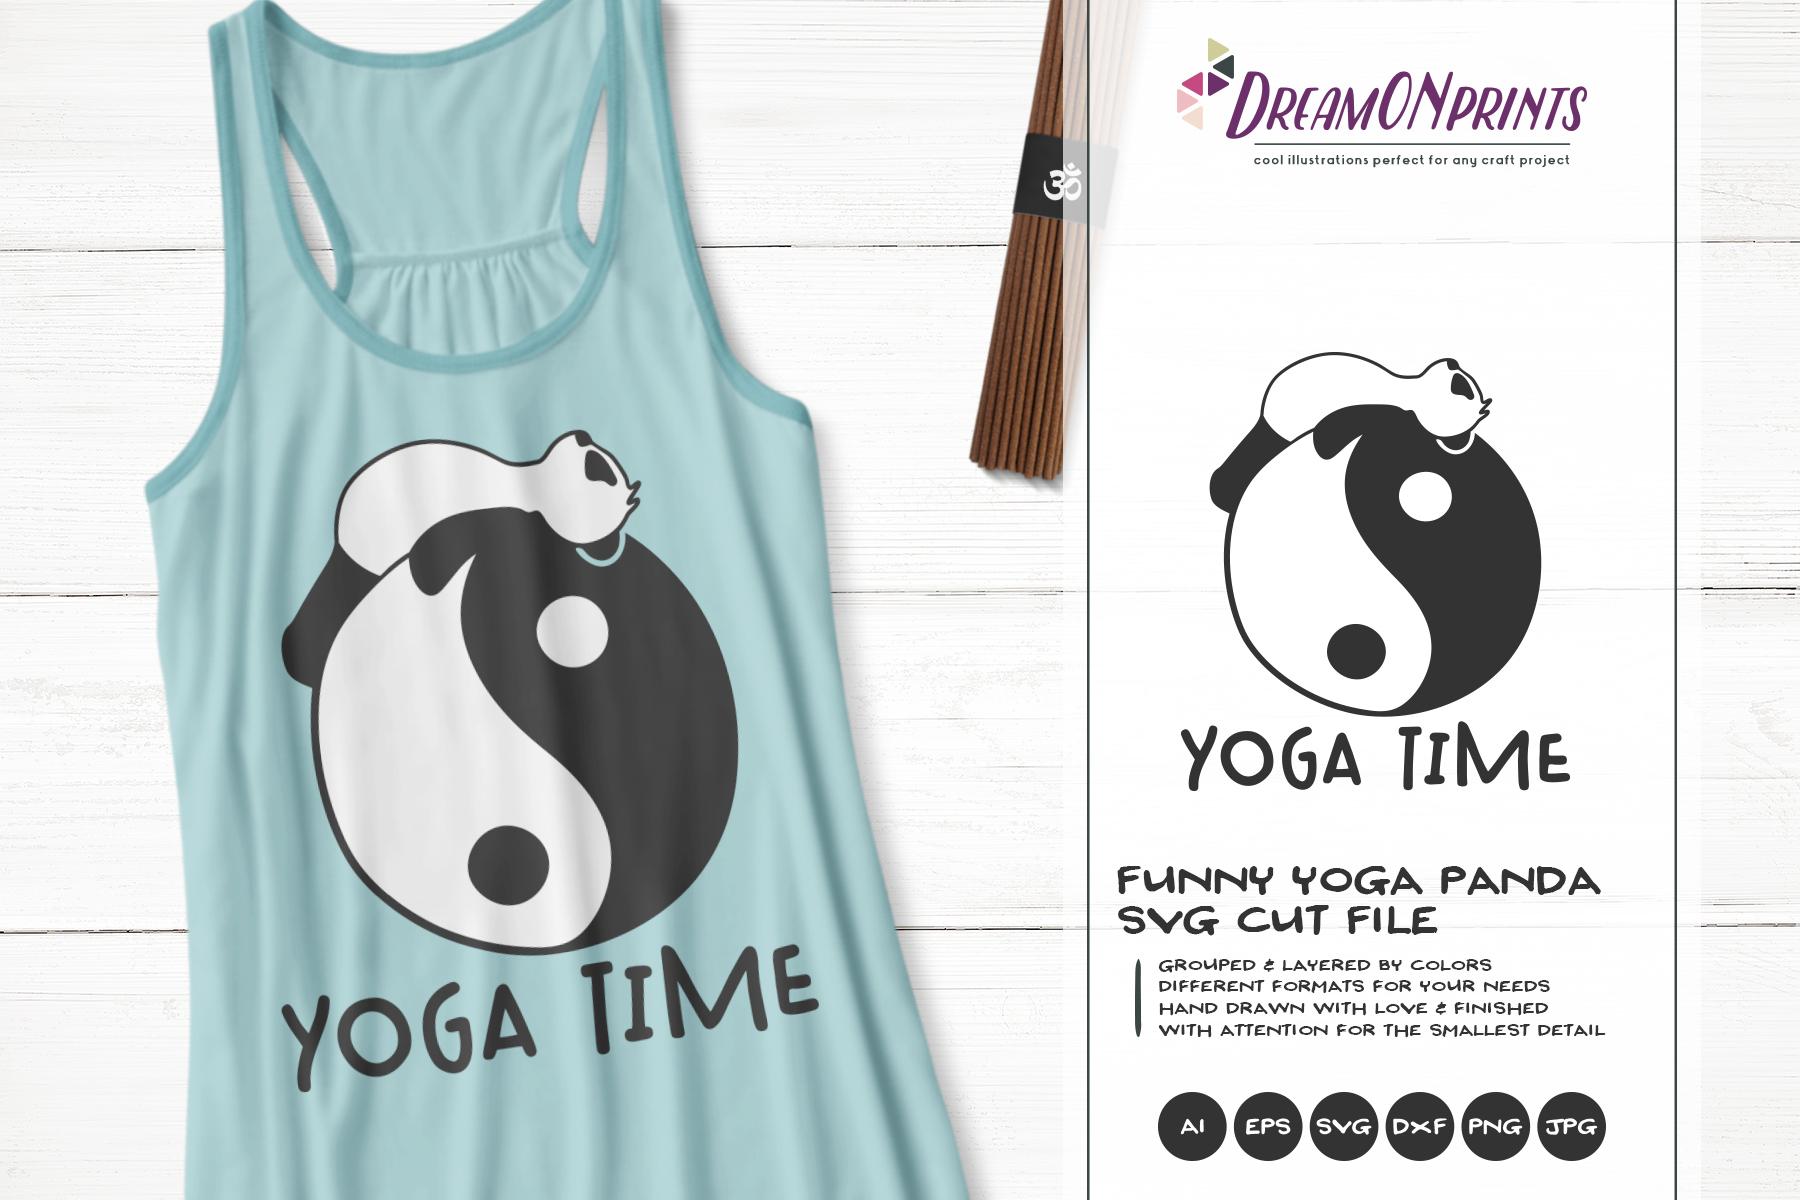 Funny Yoga Panda | Panda Bear SVG | Yoga Illustration example image 1